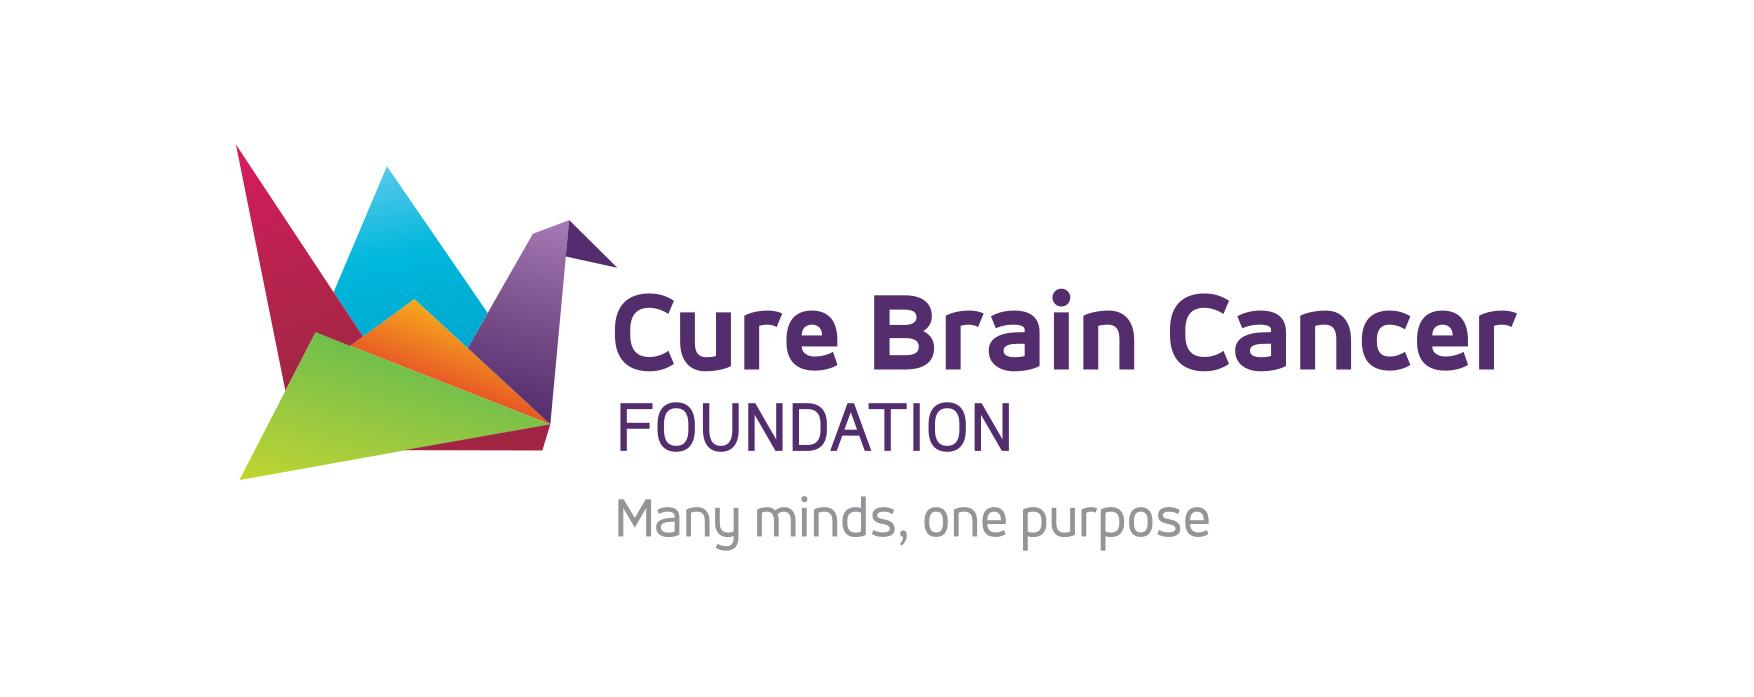 Cure Brain Cancer Foundation.jpg